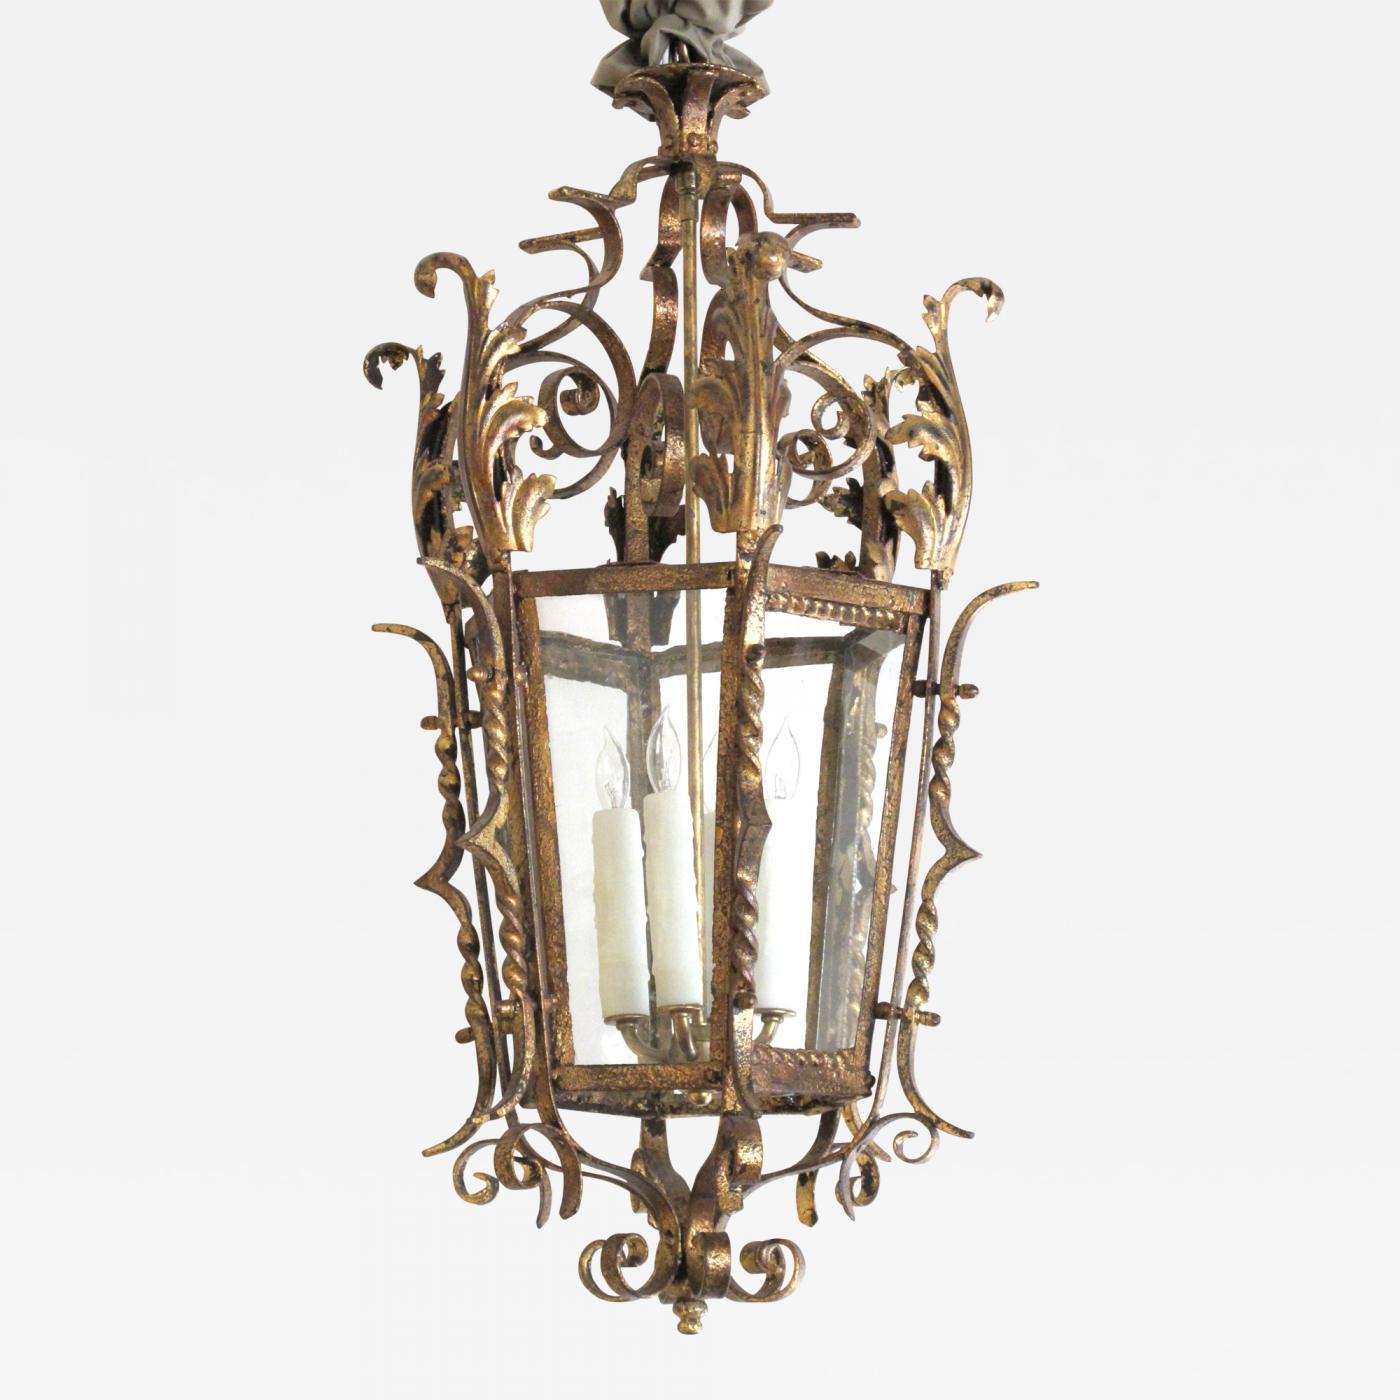 A Shapely Venetian Rococo Style Gilt Wrought Iron Lantern